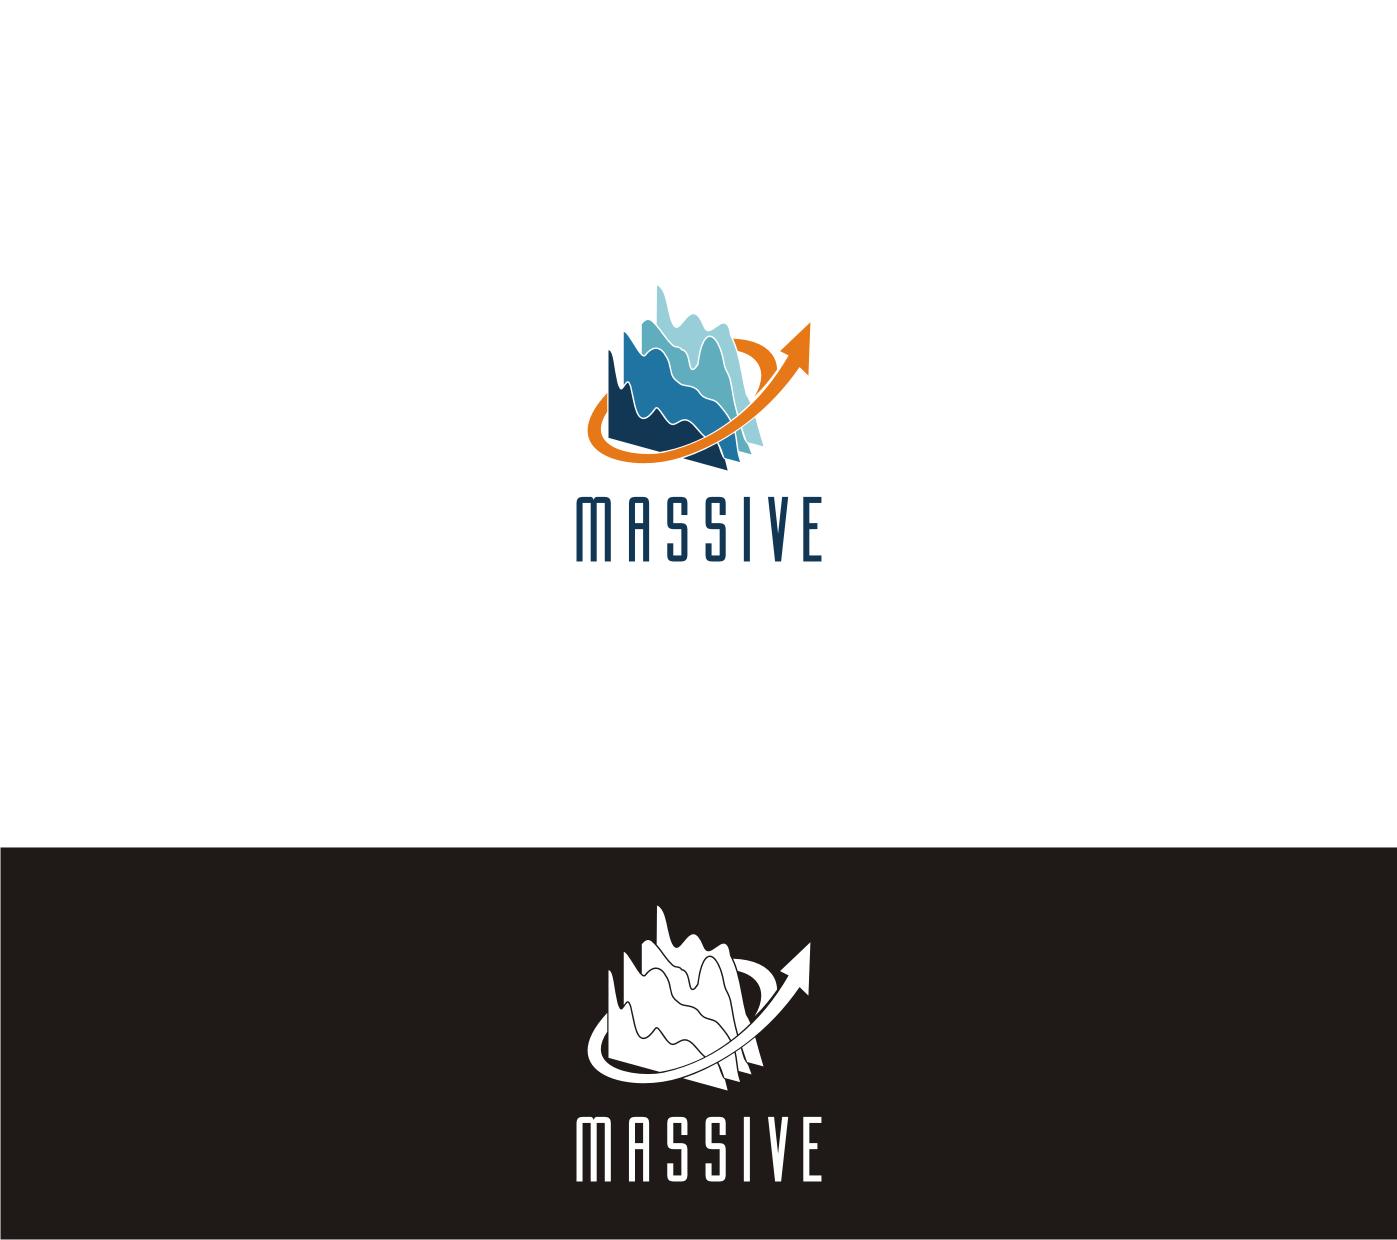 Logo Design by Sigitumarali Sigit - Entry No. 69 in the Logo Design Contest MASSIVE LOGO.